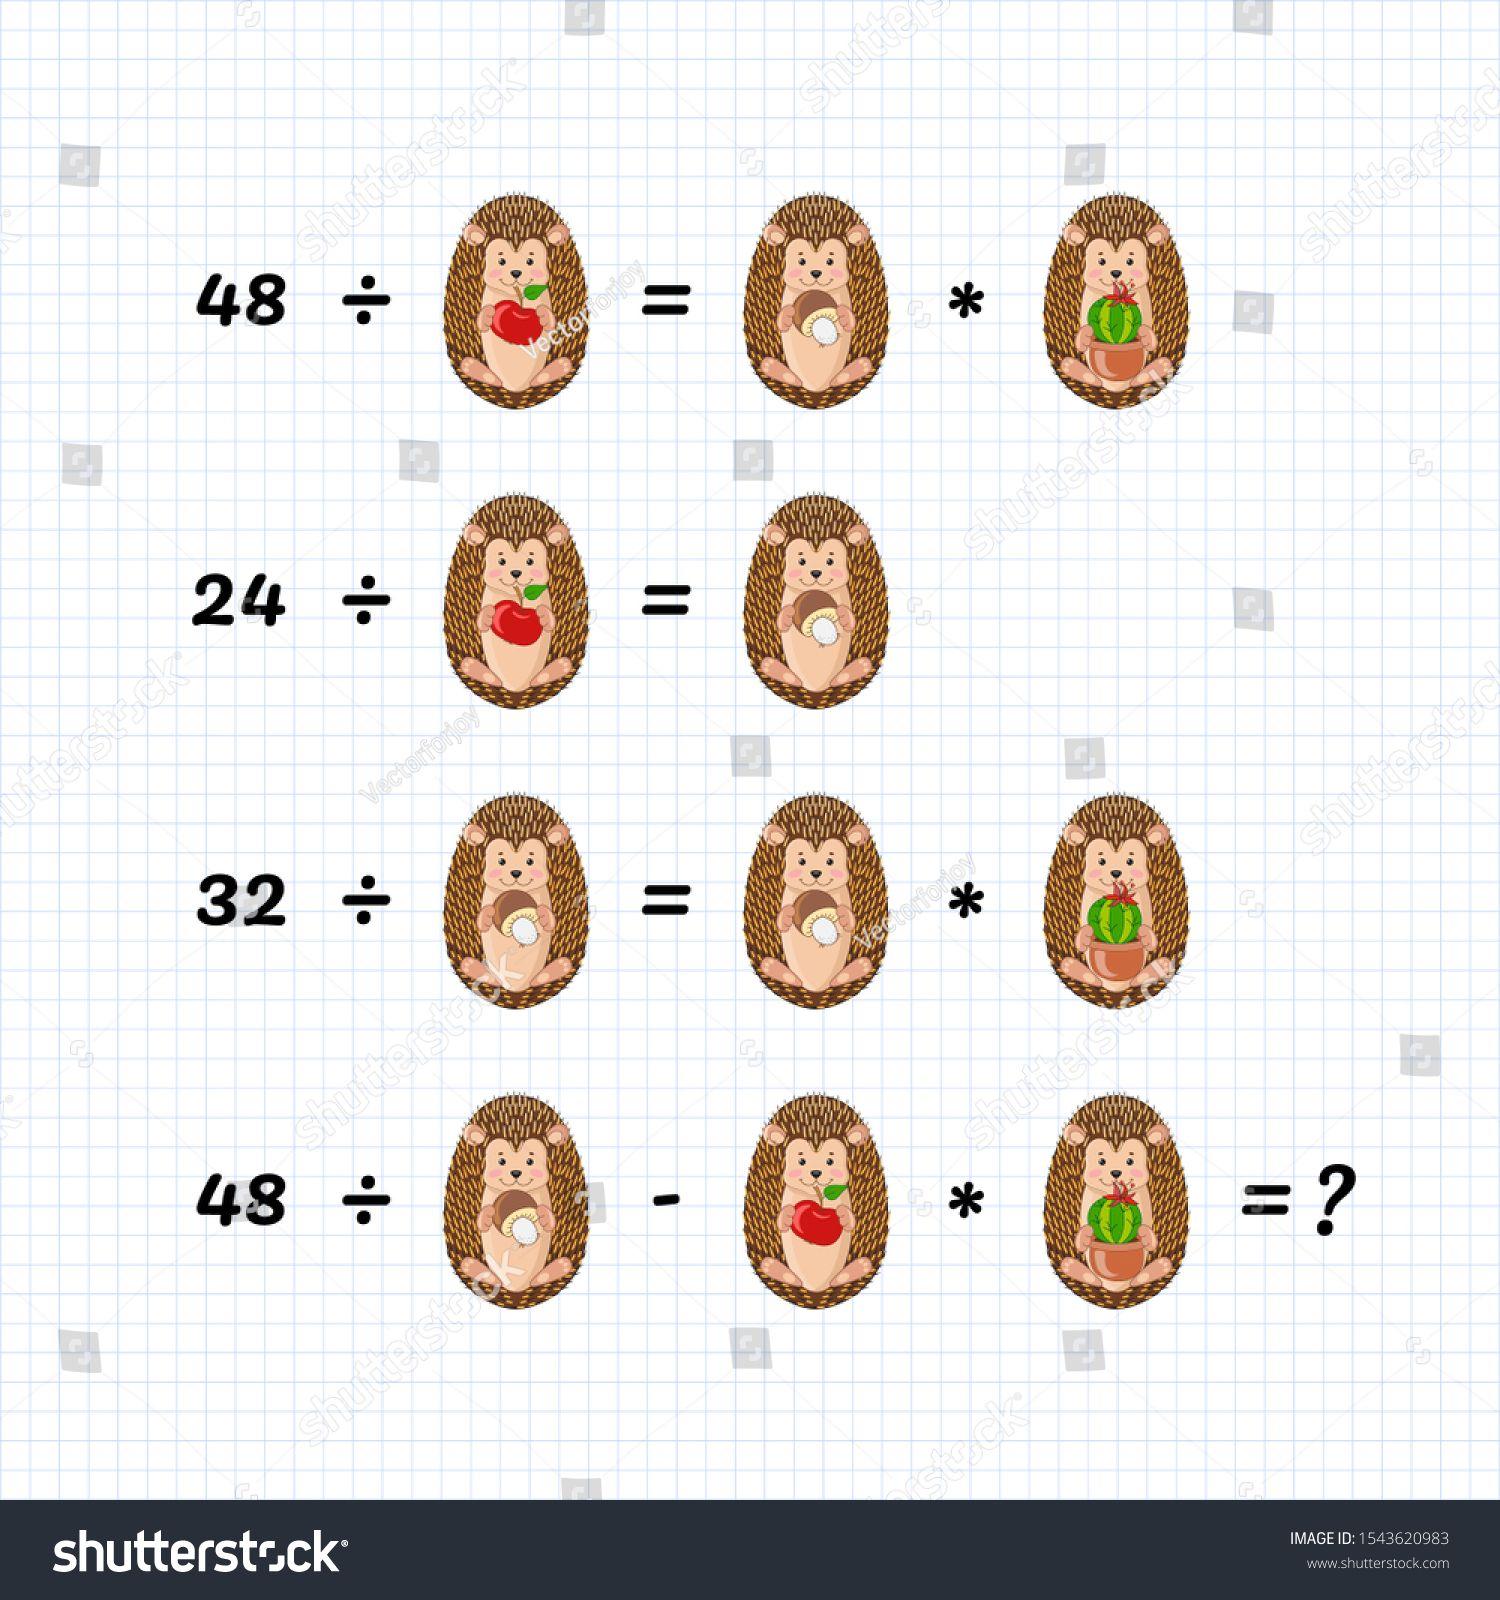 Mathematics educational game for children. Advanced level